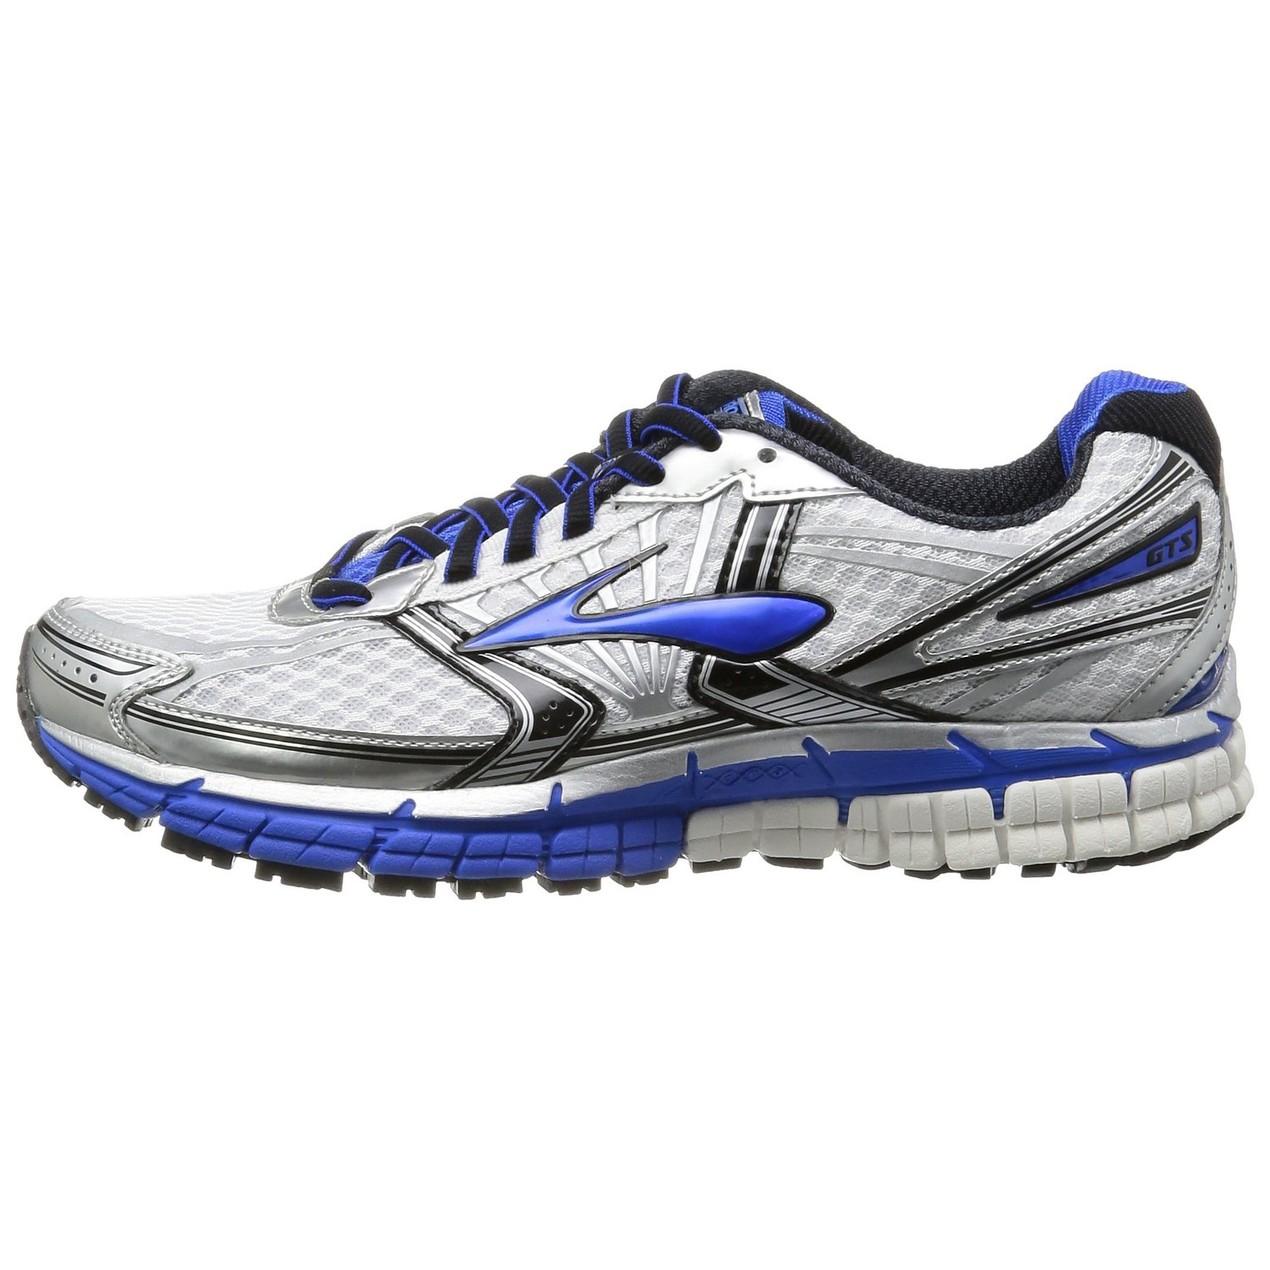 daf7942fe10 Brooks Men s Adrenaline GTS 14 Running Shoe - Tanga